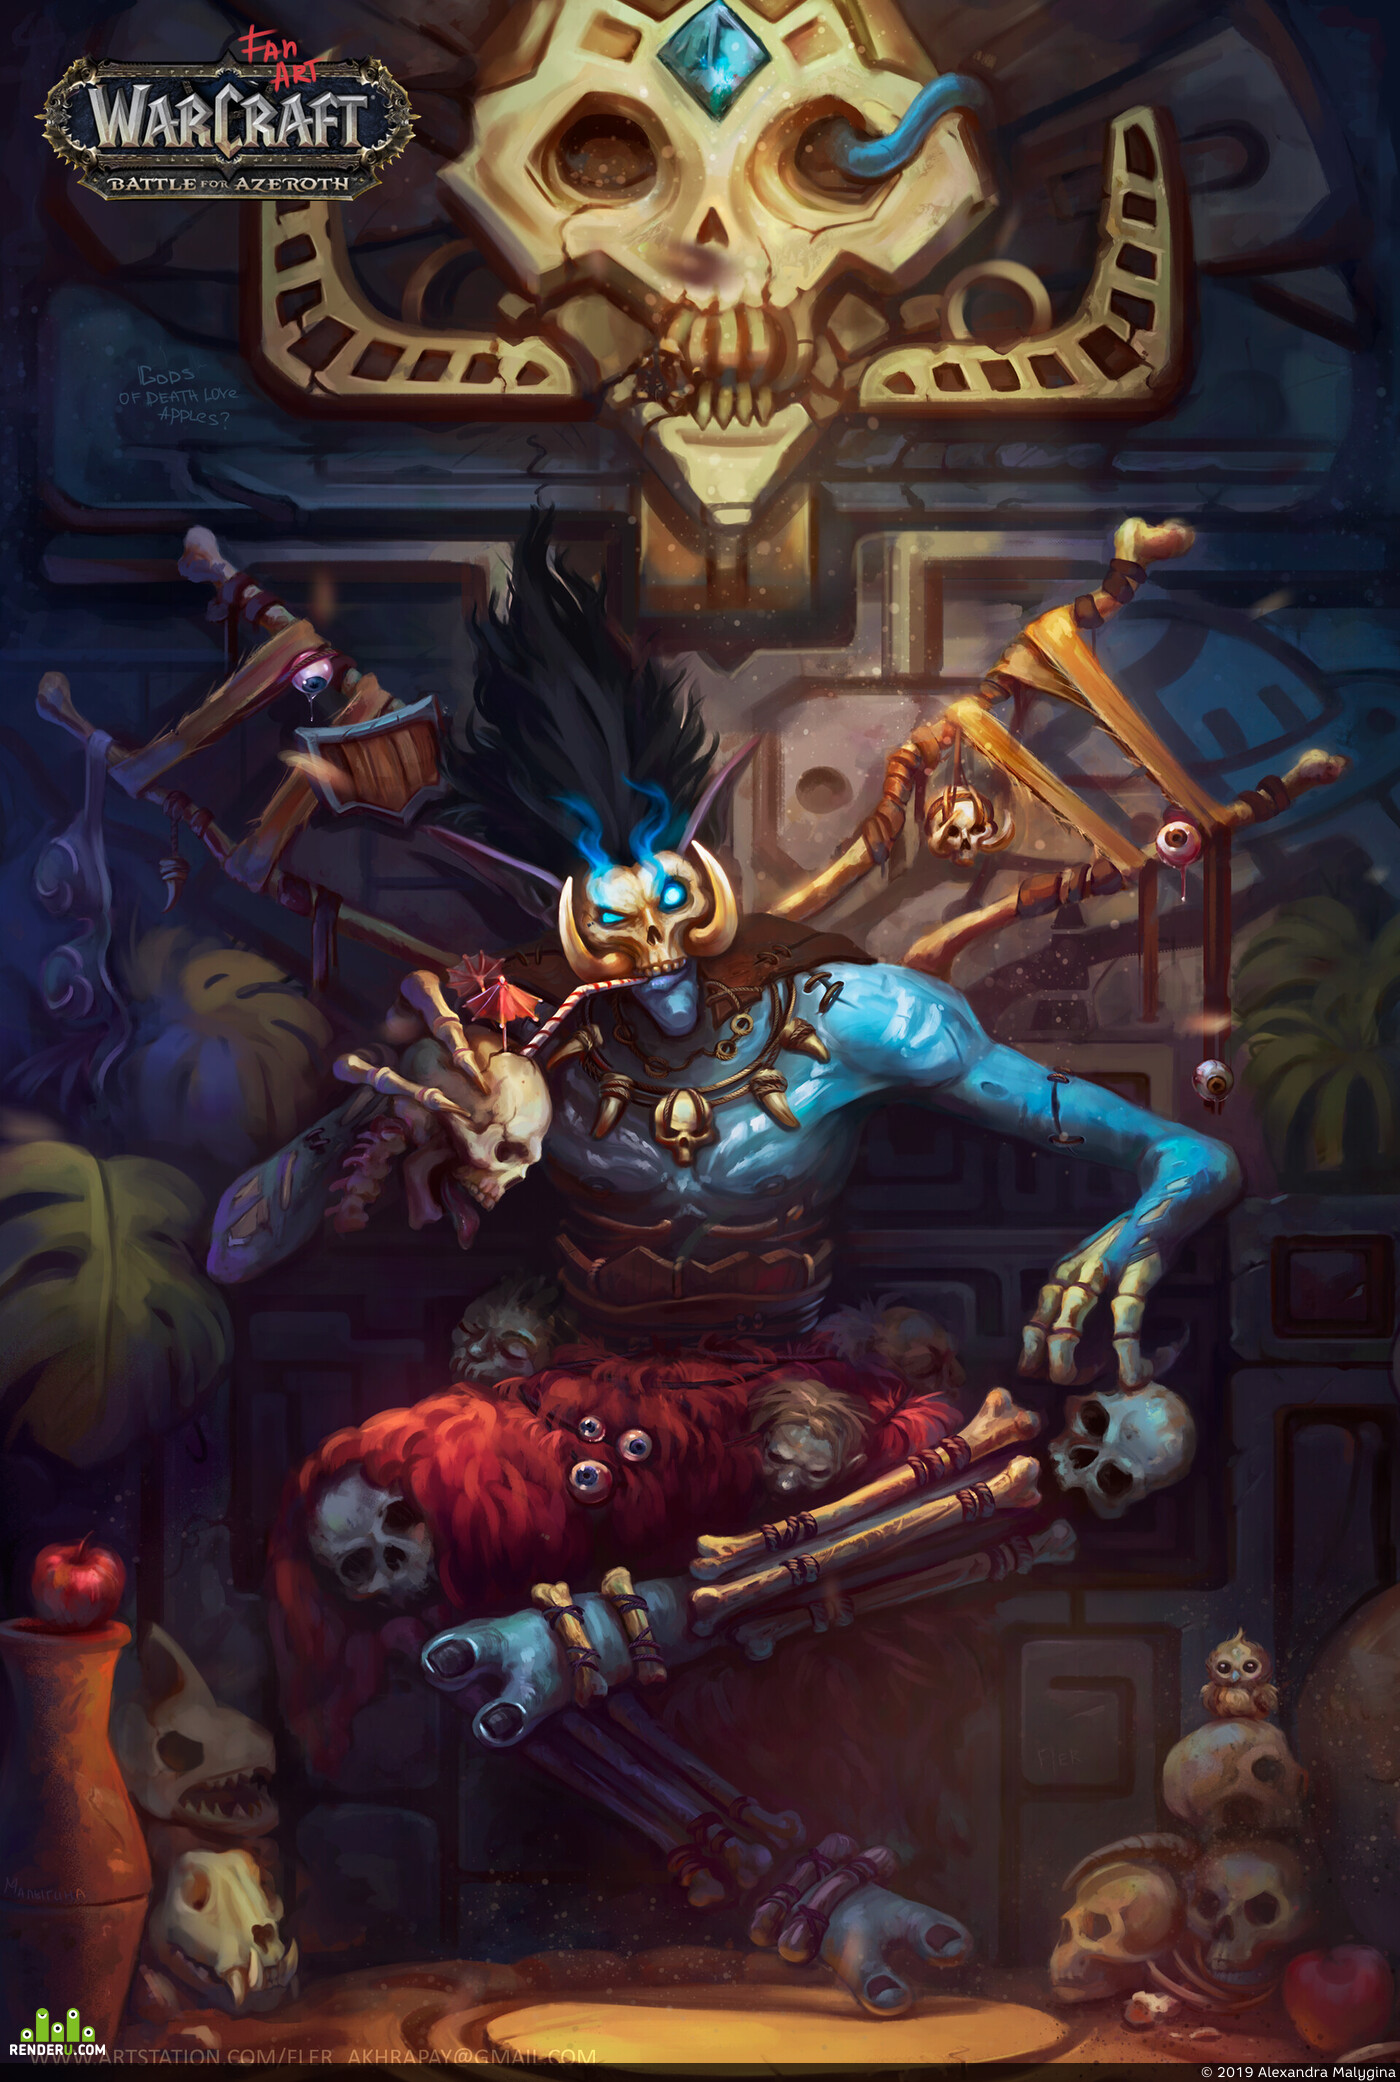 WorldOfWarcraft, Fantasy, Warcraft III, Варфракт, Фэнези